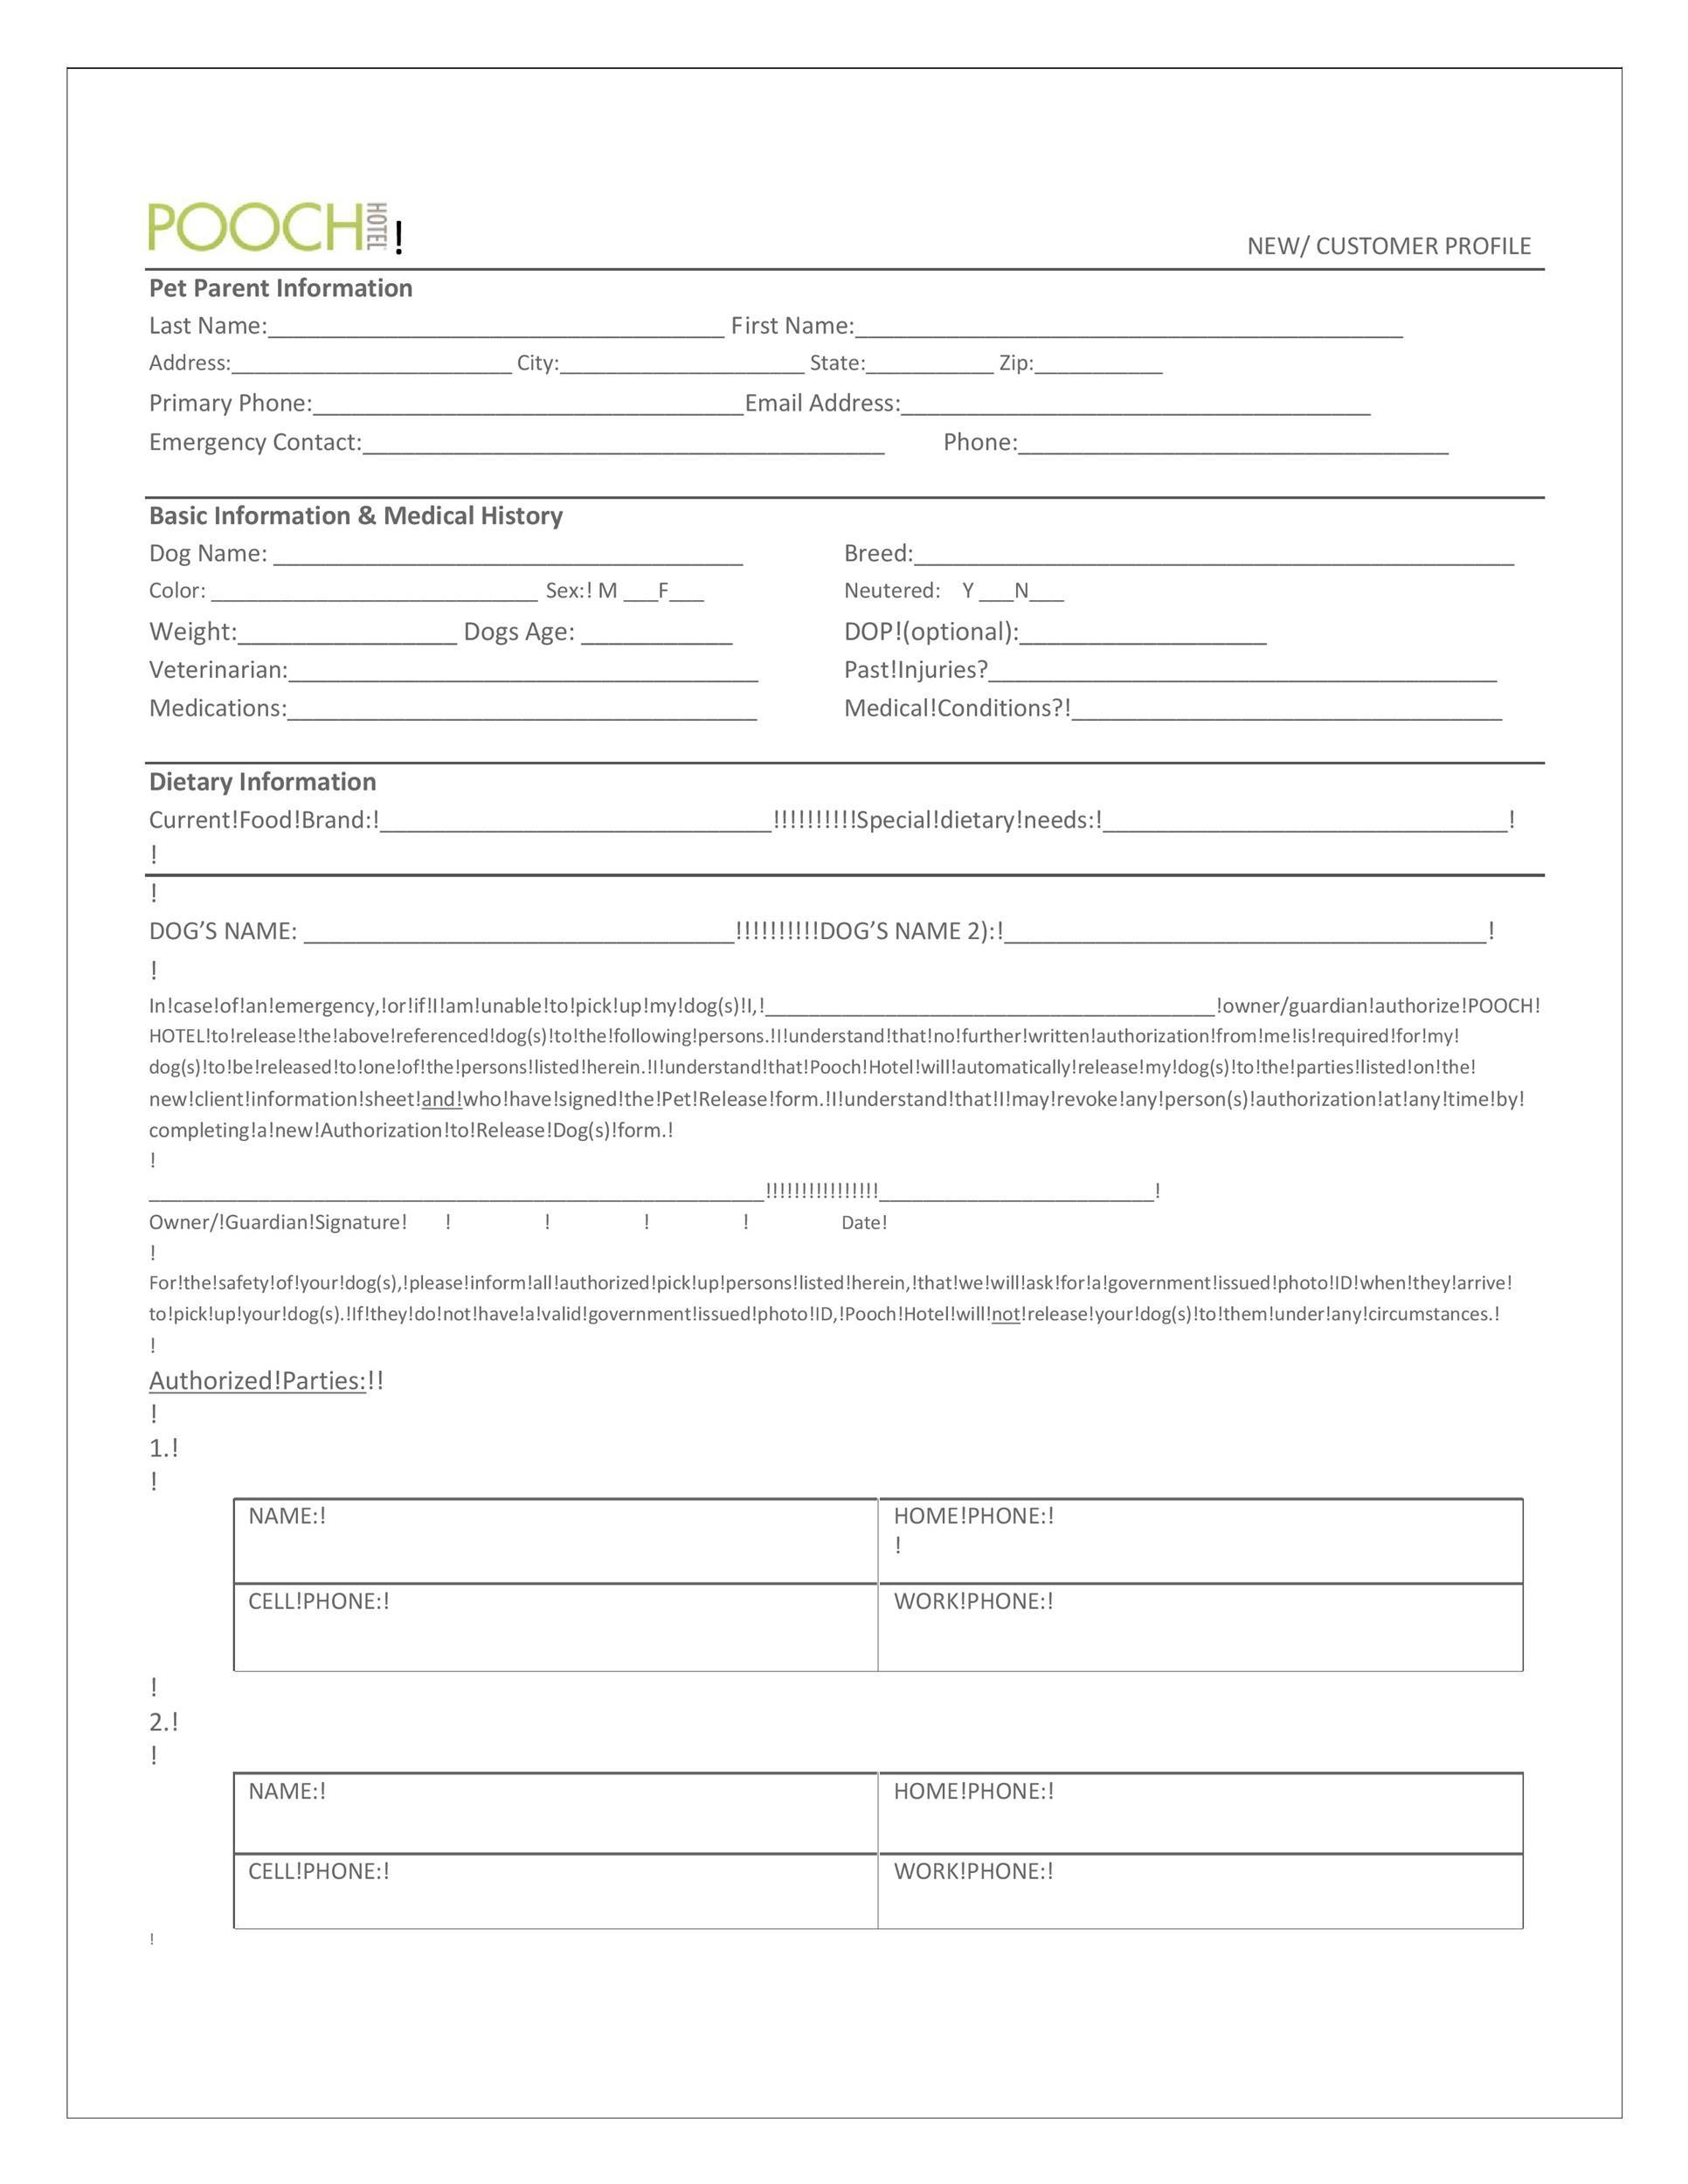 Free customer profile template 39